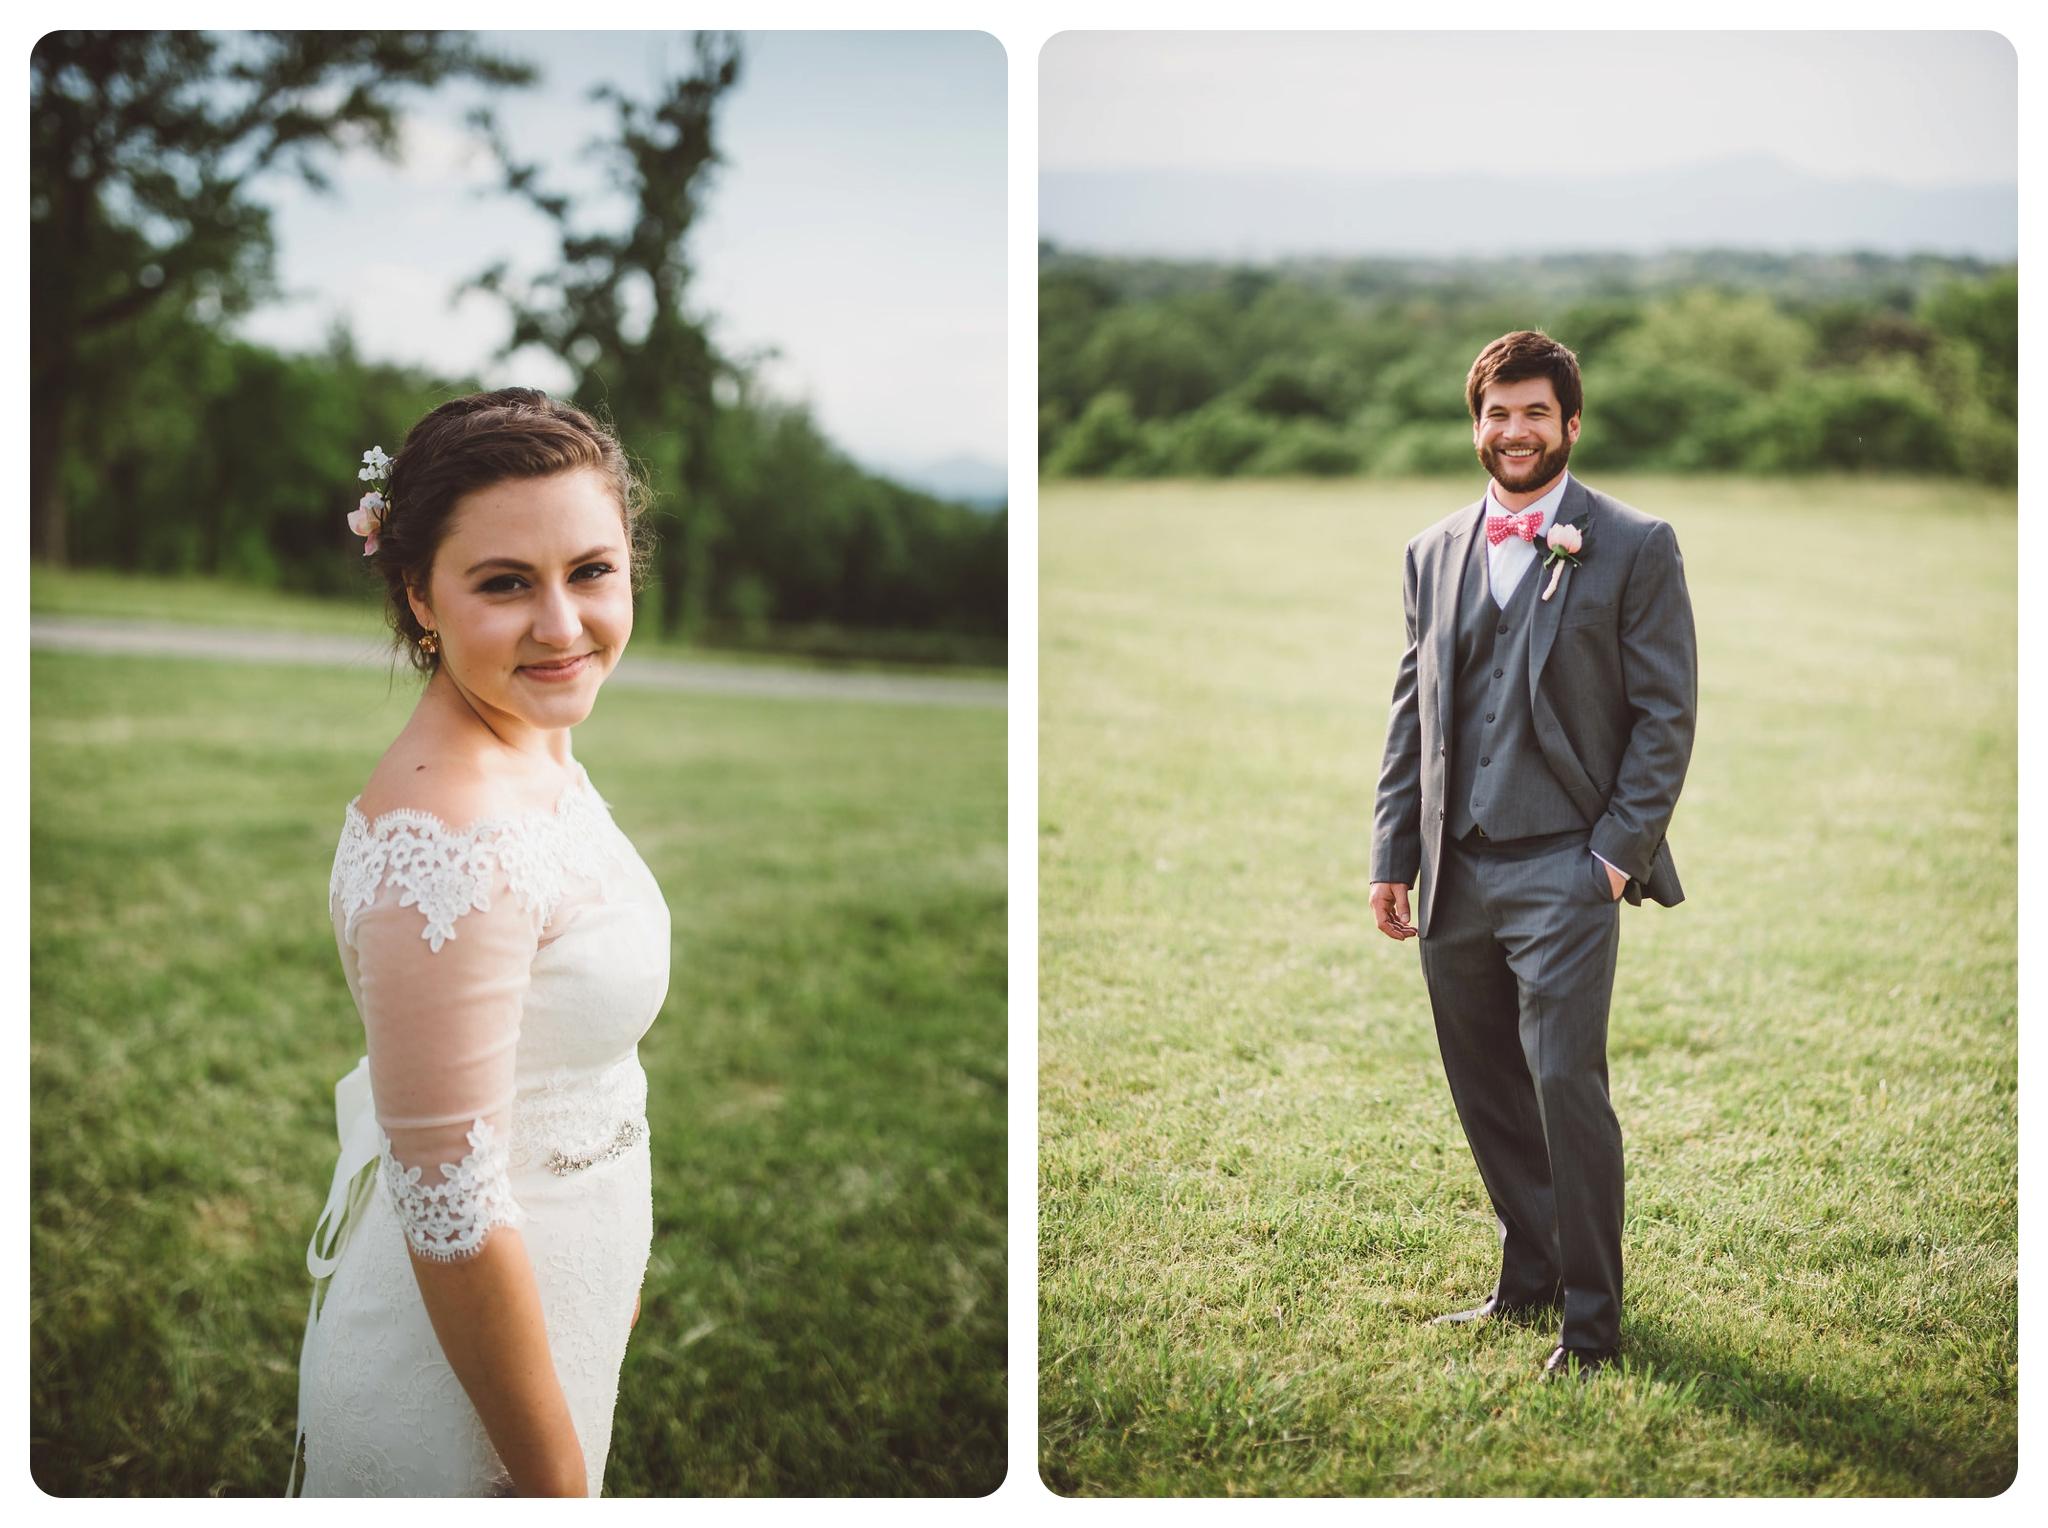 Braeloch-Weddings-Wedding-Photographer-Pat-Cori-Photography-028.jpg